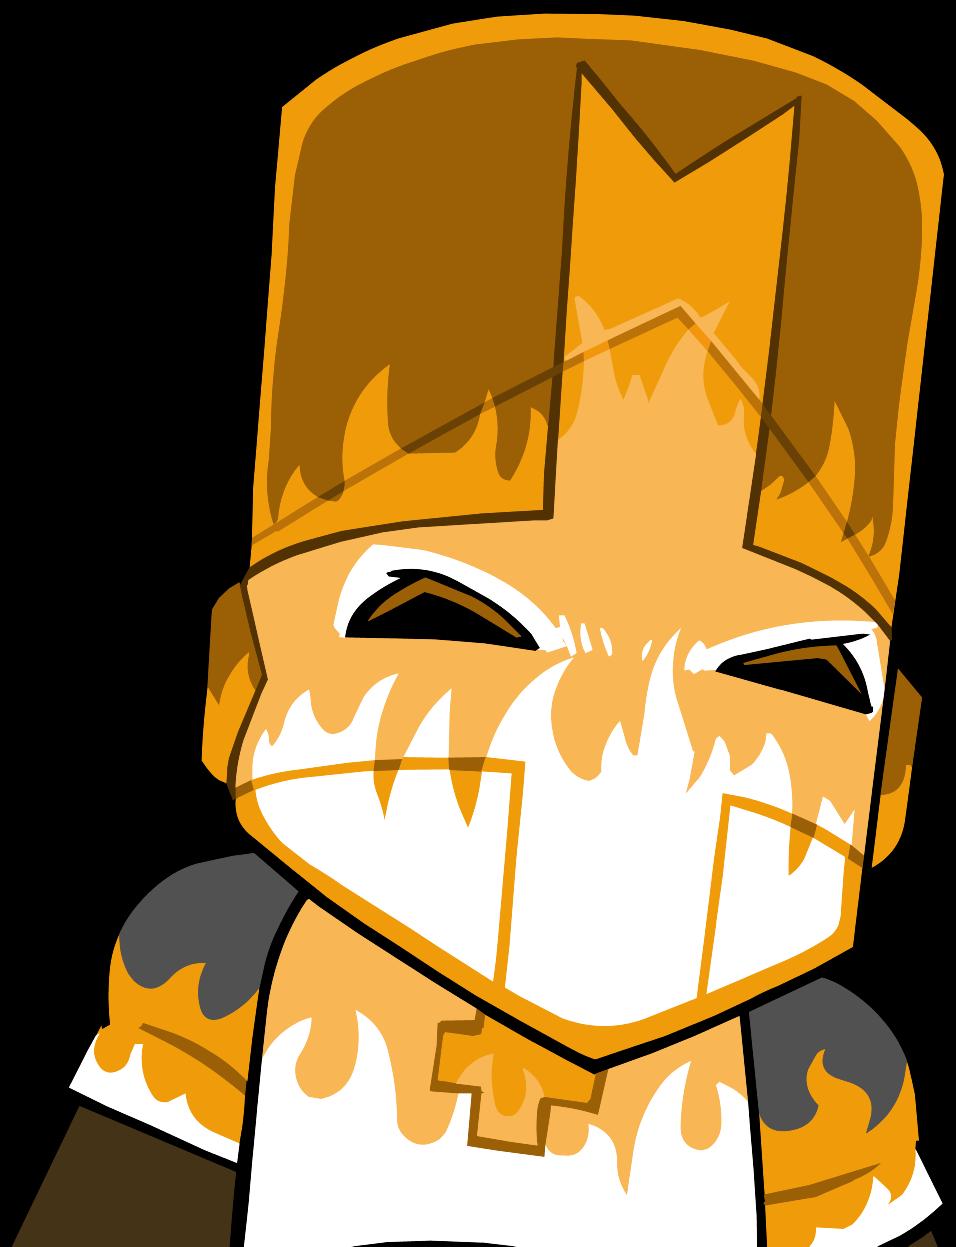 Castle crashers orange knight minecraft skin